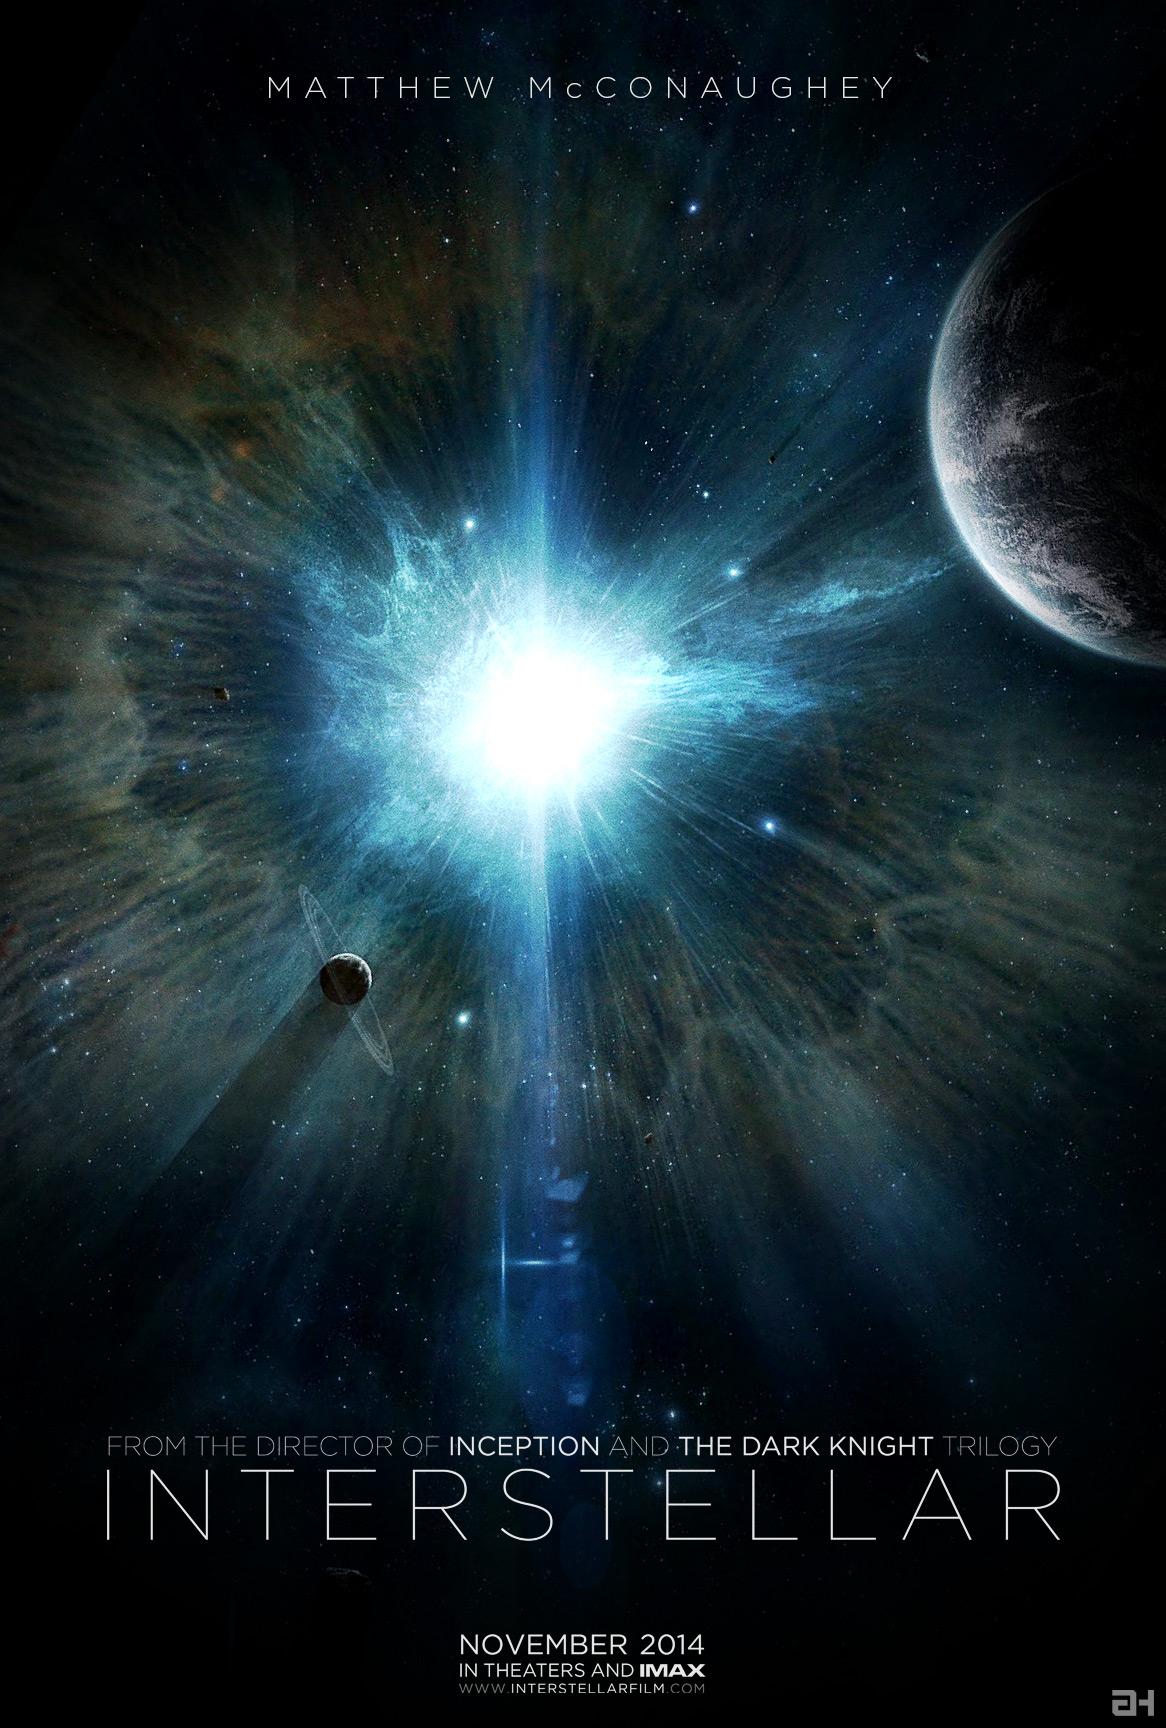 Interstellar Poster interstellar-poster | ...